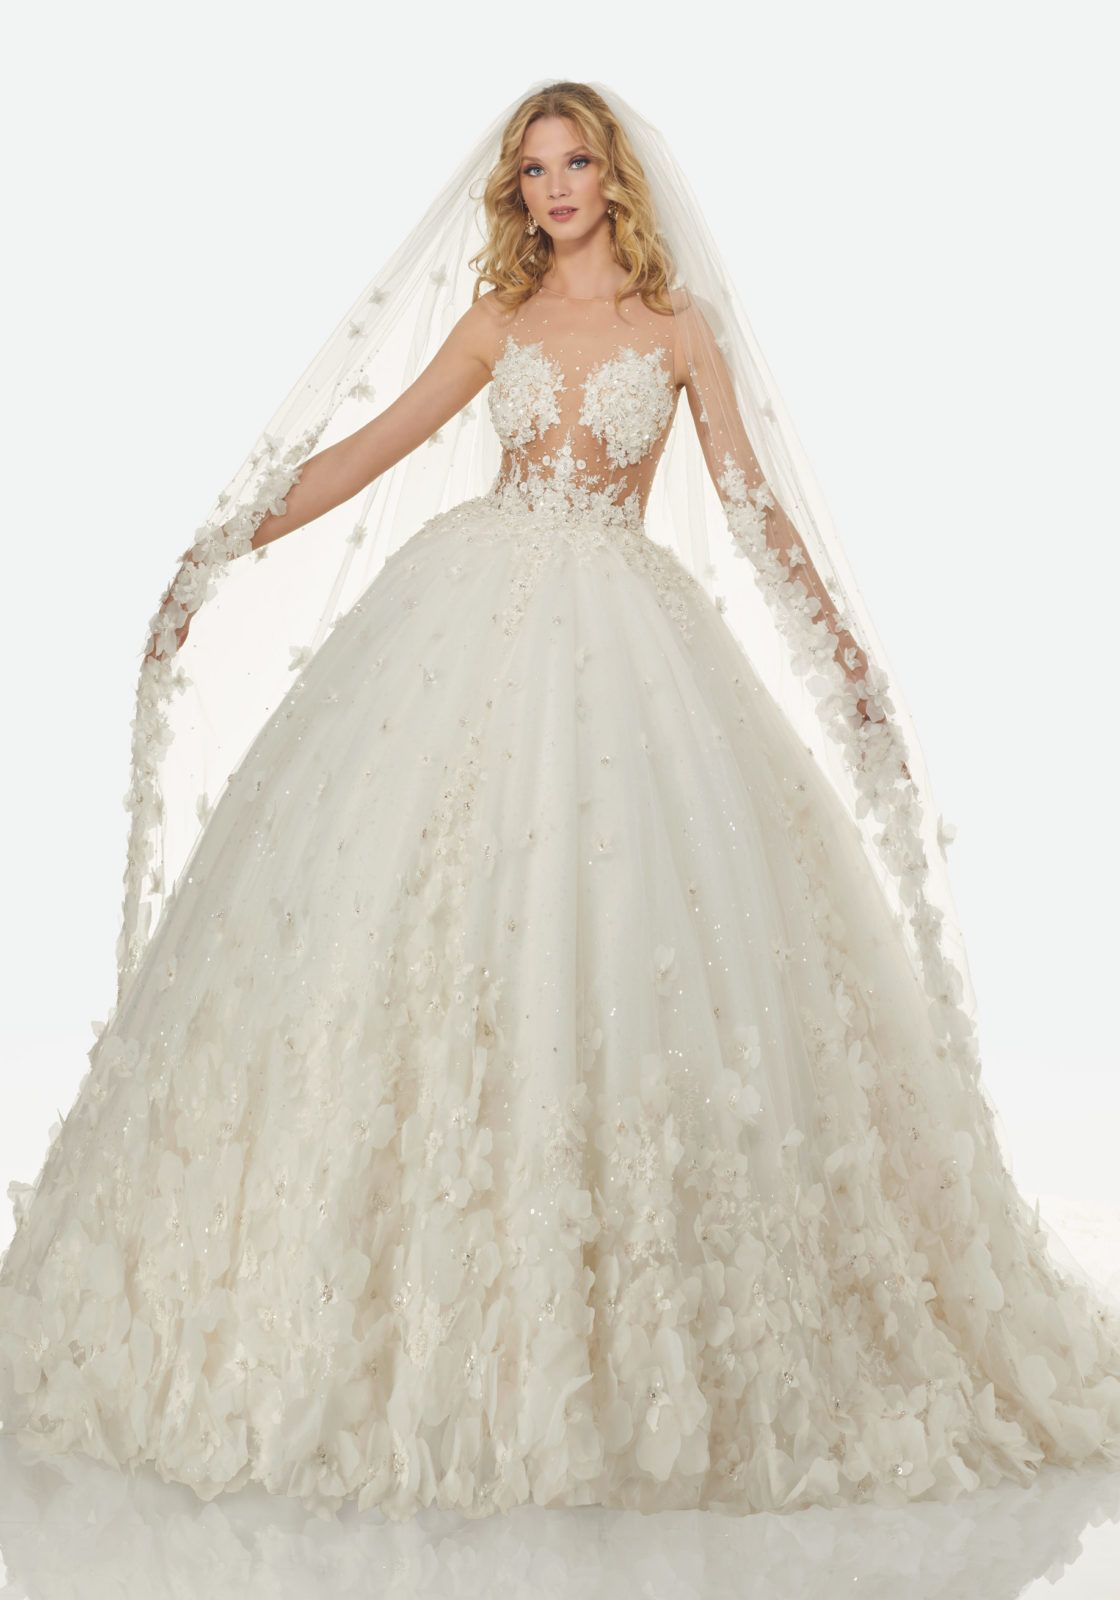 Brandi Wedding Dress Randy Fenoli Bridal Ball Gown Wedding Dress Ball Gowns Wedding Wedding Dresses Lace